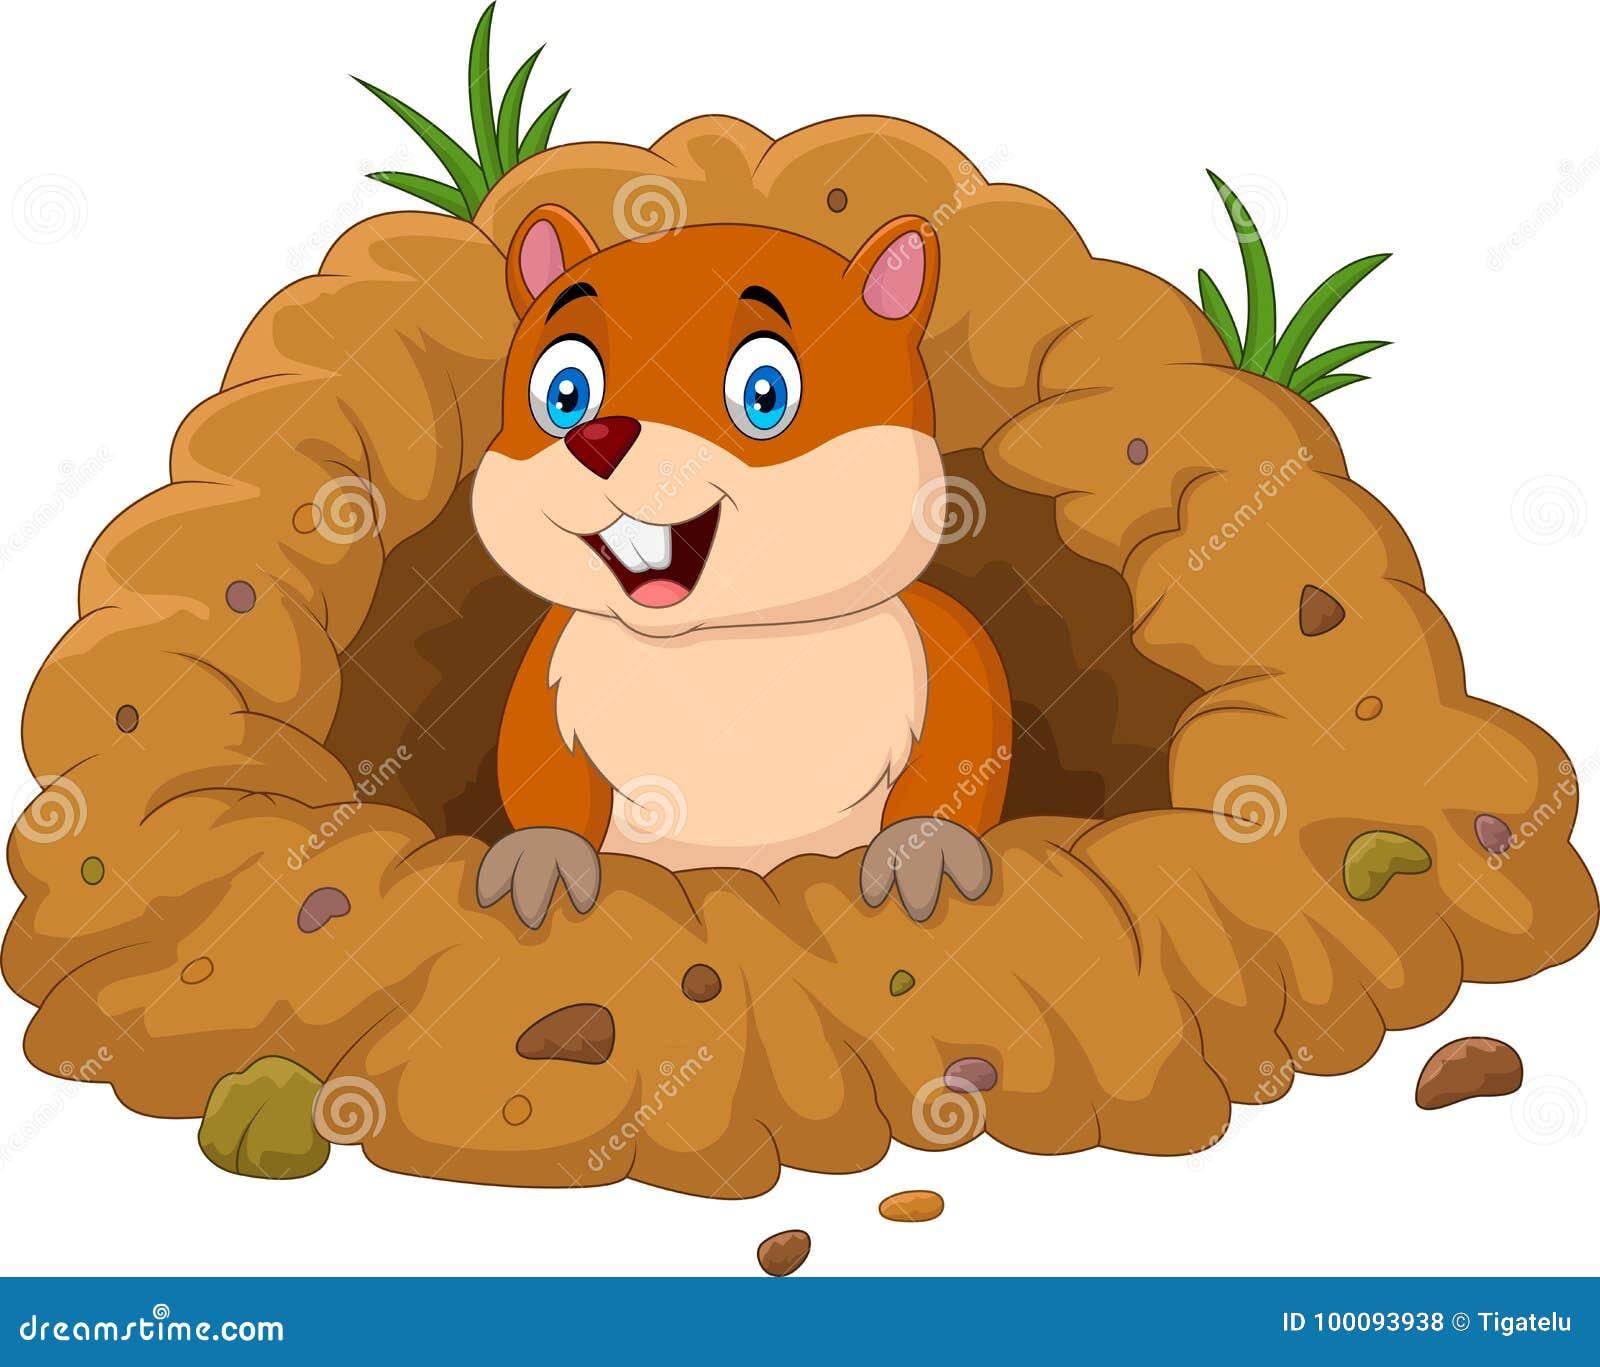 cartoon groundhog stock illustrations 1 167 cartoon groundhog rh dreamstime com groundhog clip art images groundhog clipart free